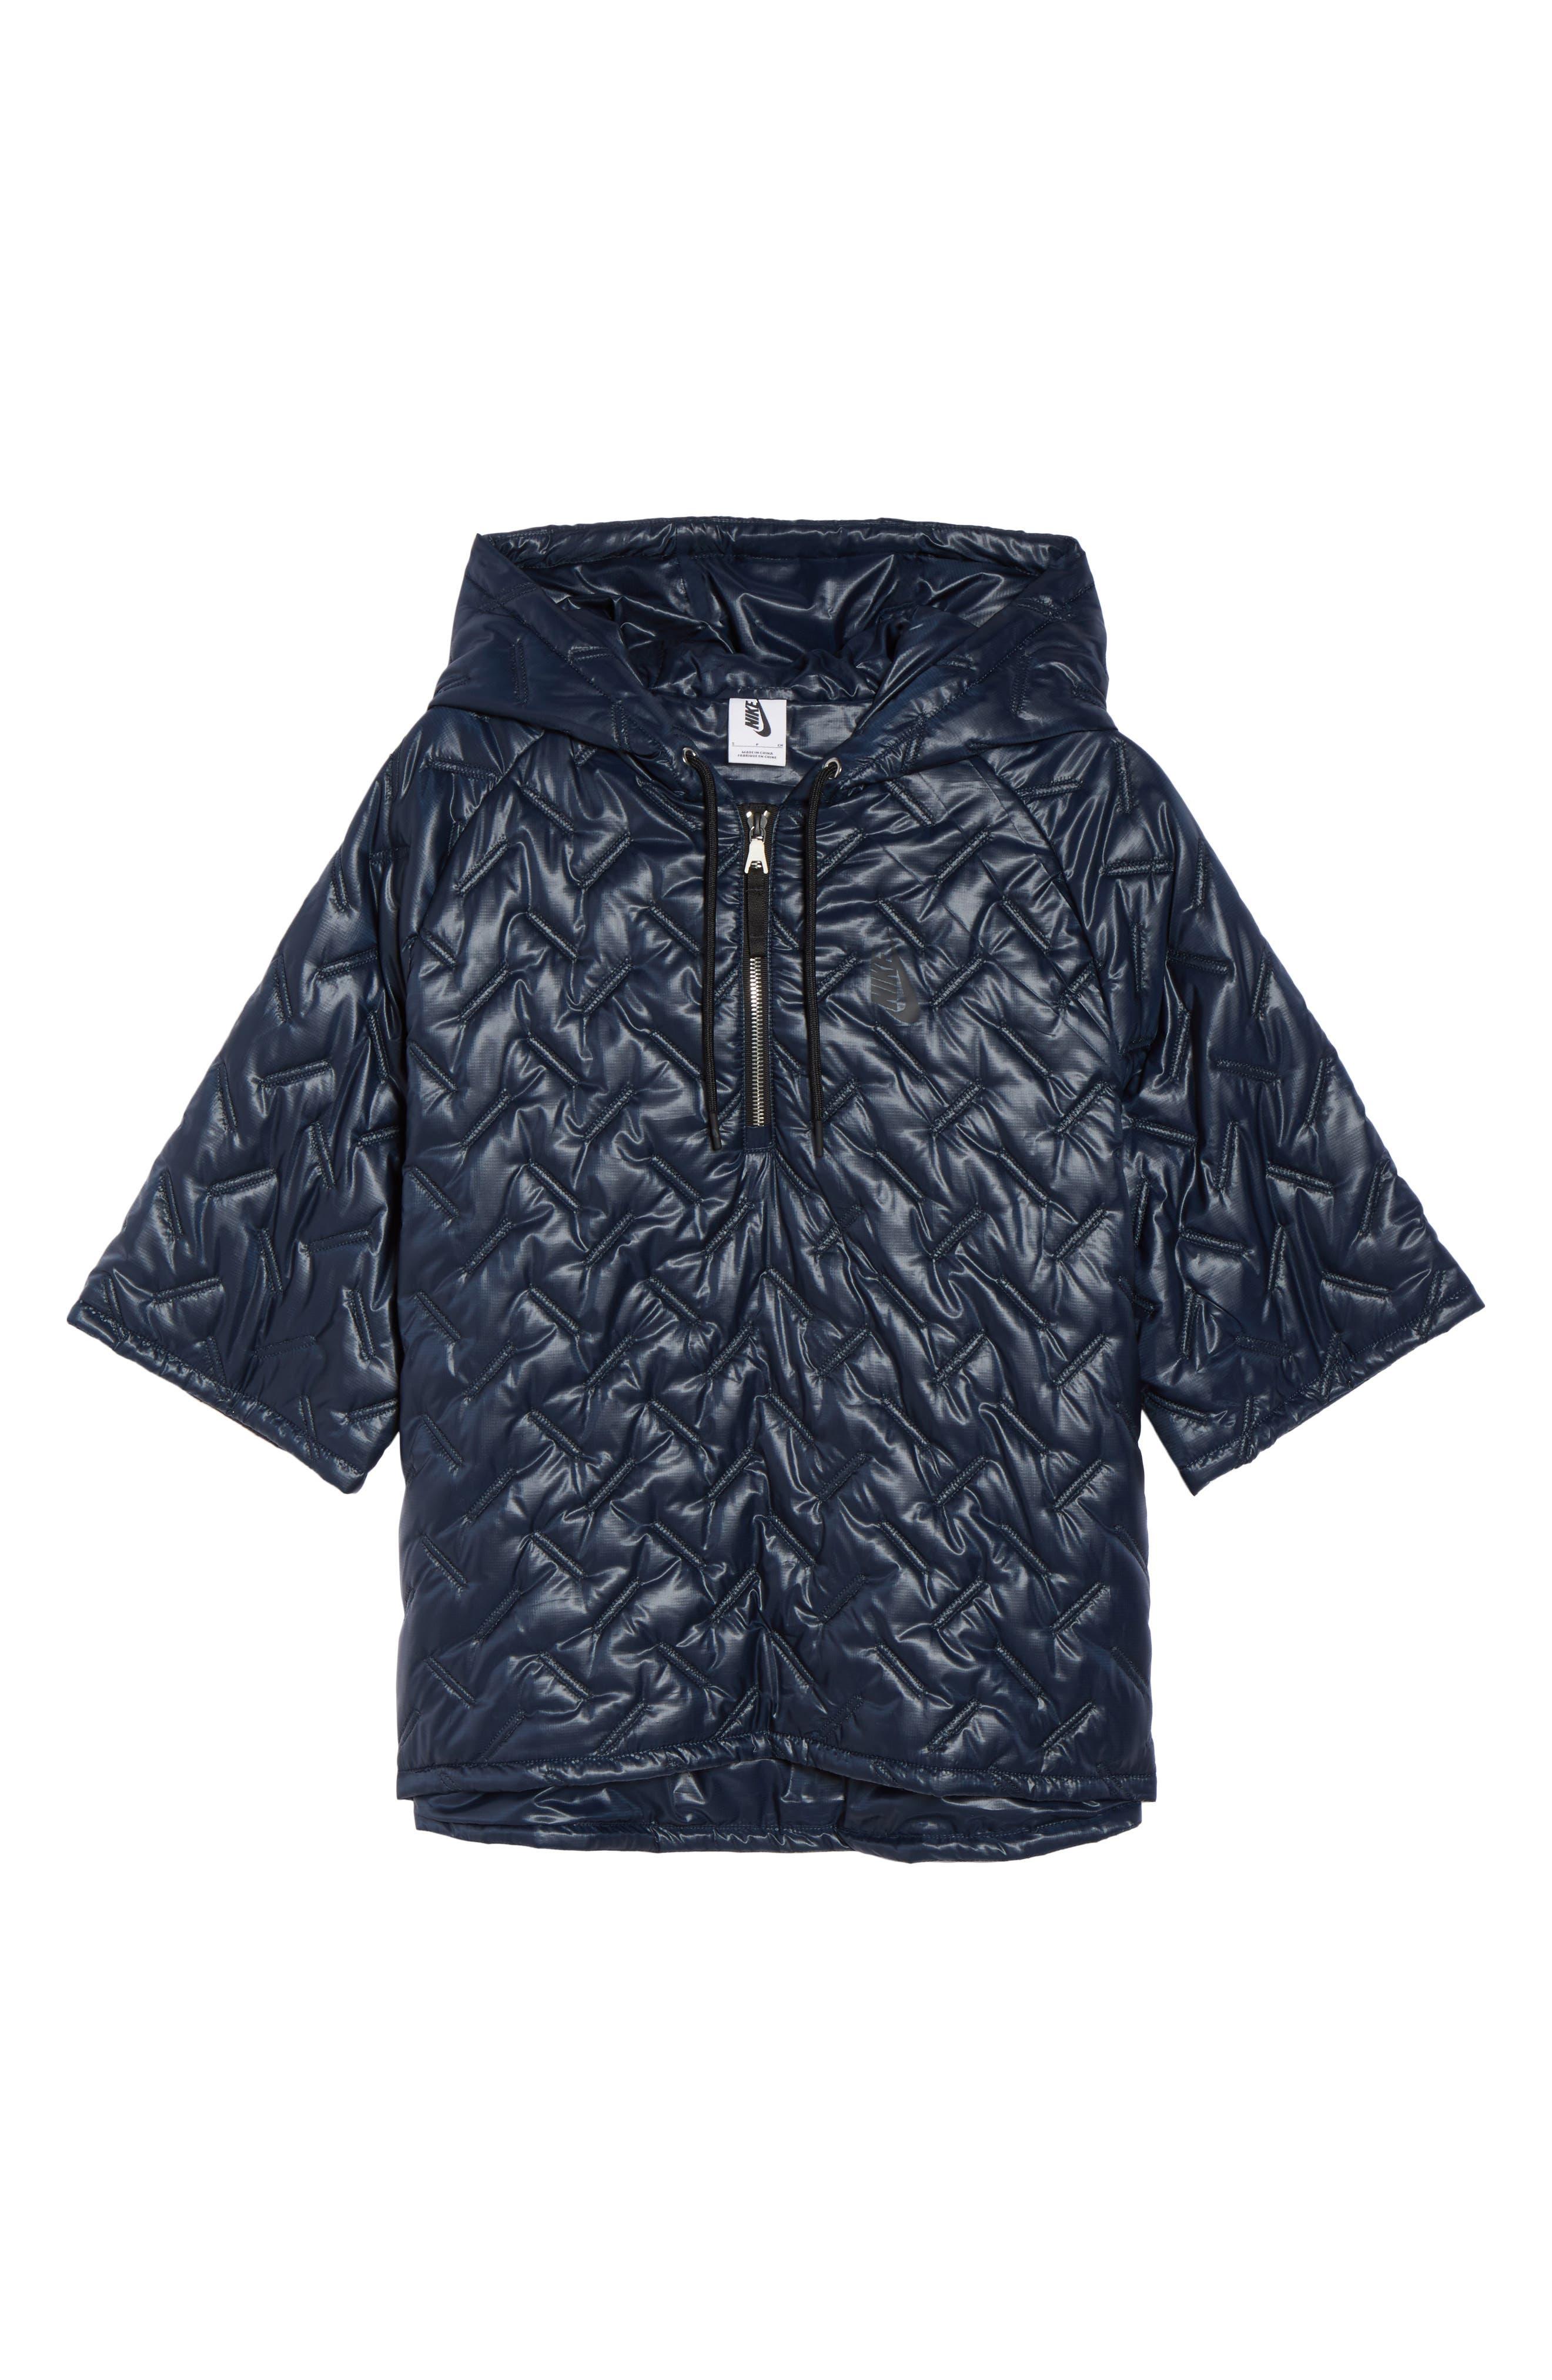 NikeLab Essentials Insulated Short Sleeve Women's Hoodie,                             Alternate thumbnail 12, color,                             Dark Obsidian/ Black